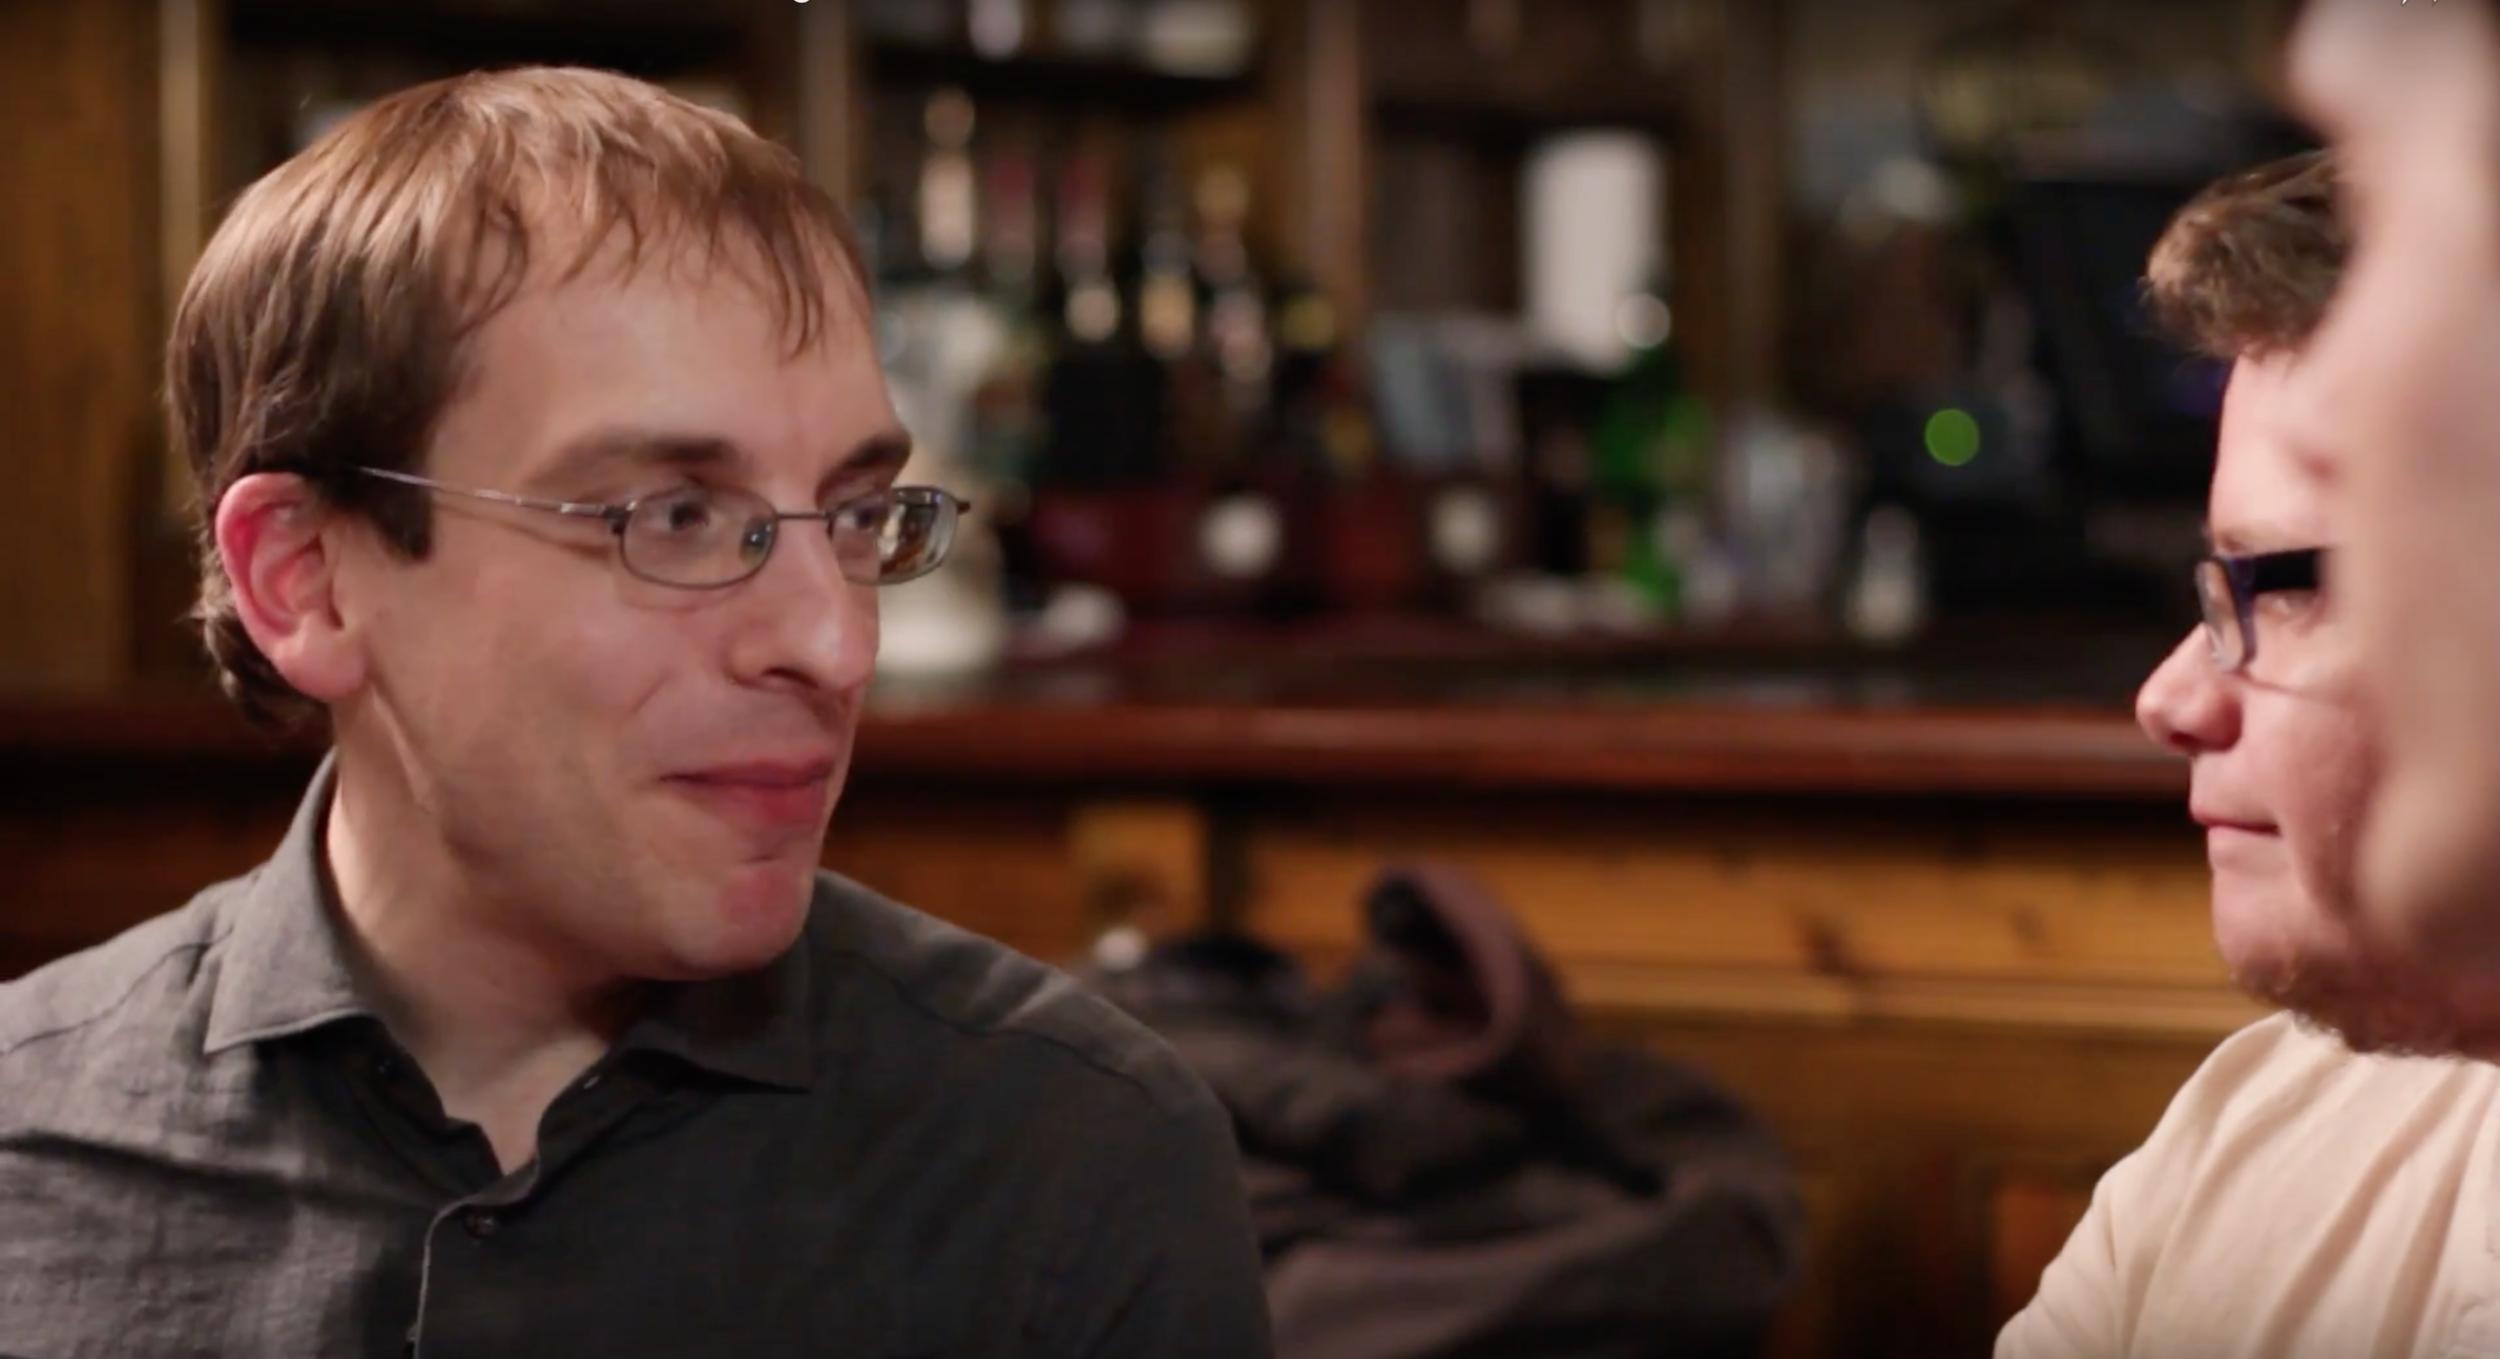 Matt Fagerholm, Assistant Editor At Roger Ebert.com